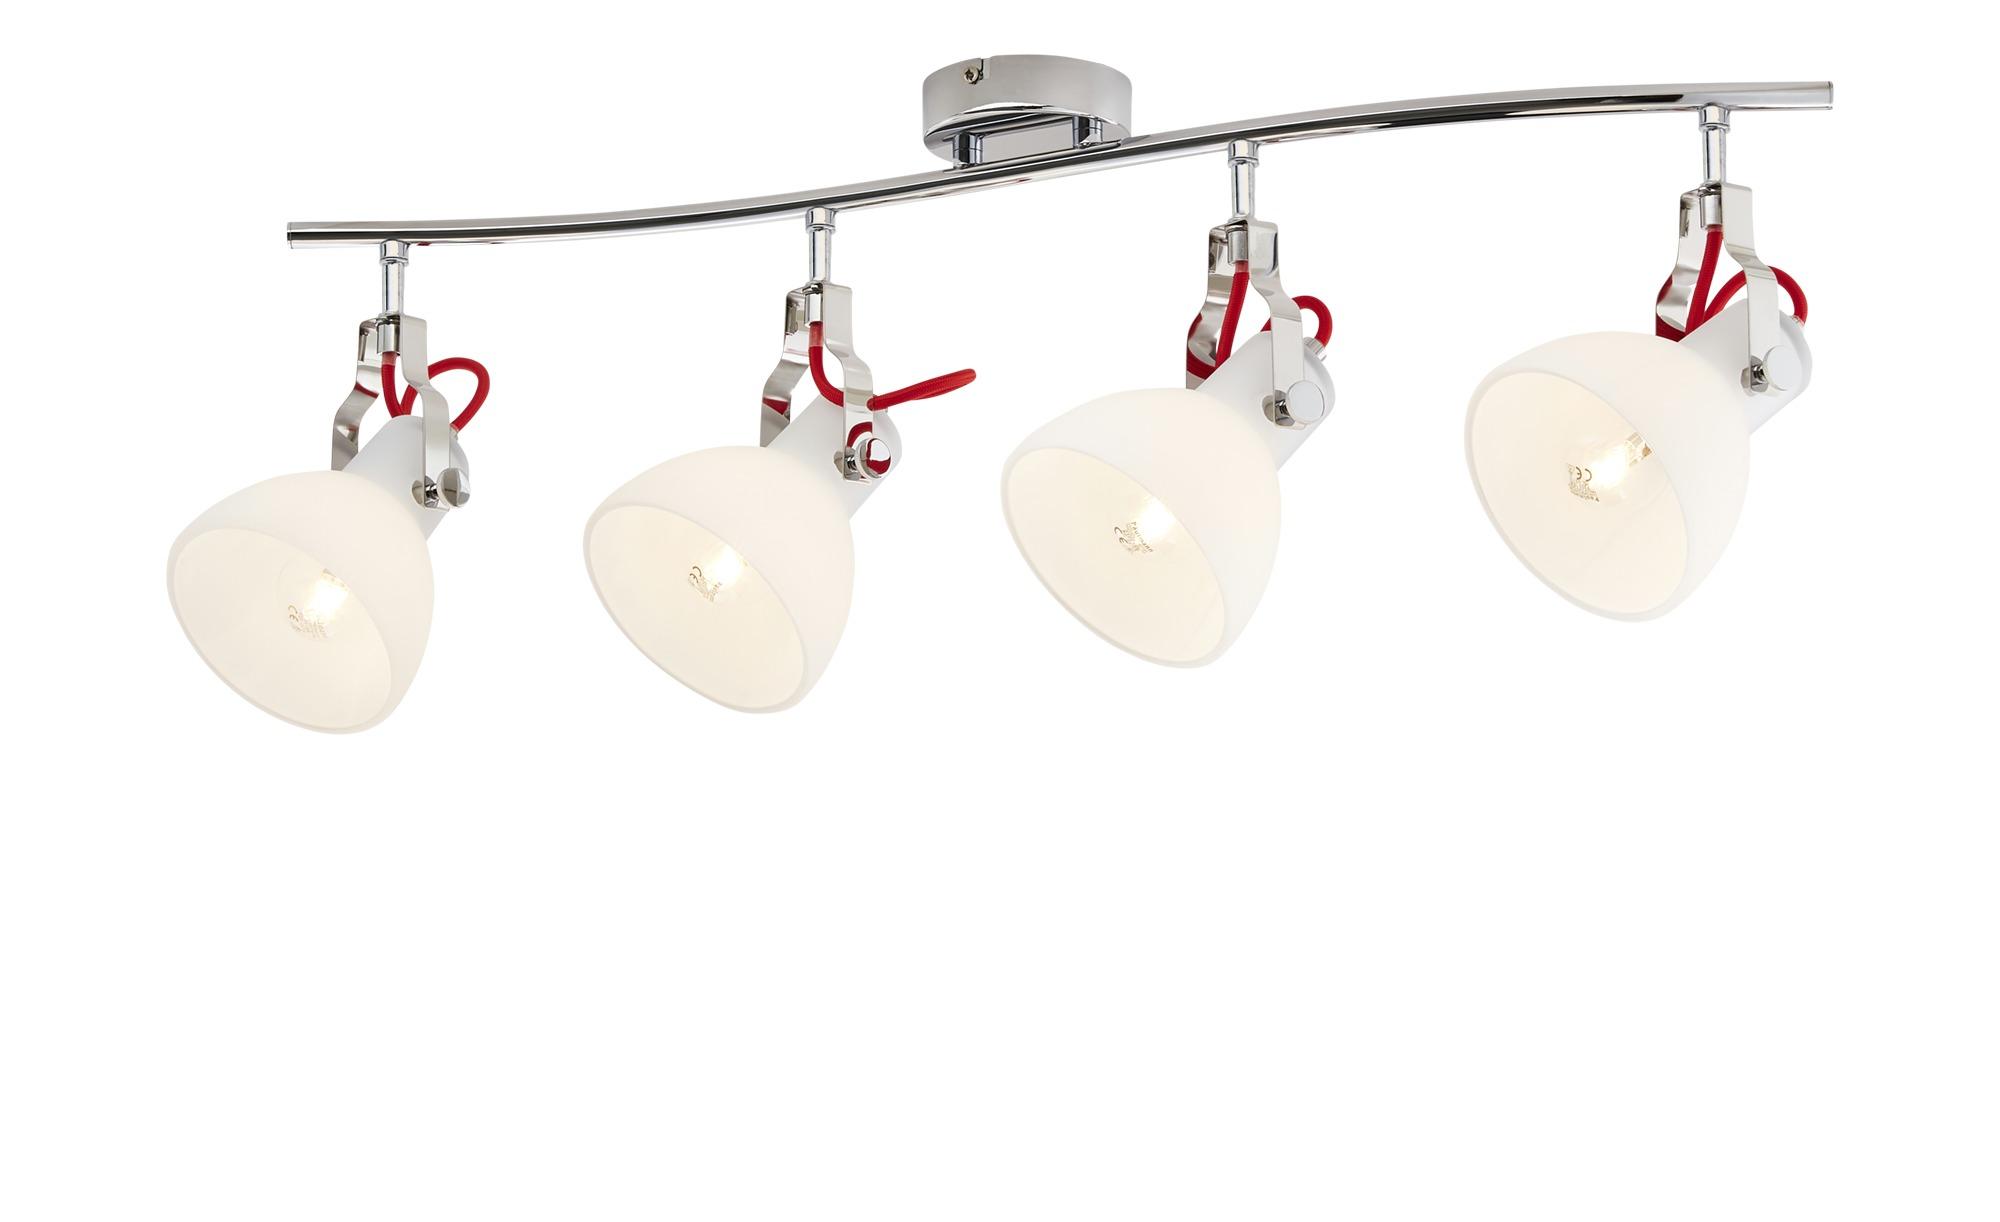 KHG Deckenleuchte, 4-flammig, chorm ¦ silber ¦ Maße (cm): B: 29,5 H: 24 Lampen & Leuchten > Innenleuchten > Deckenleuchten - Höffner